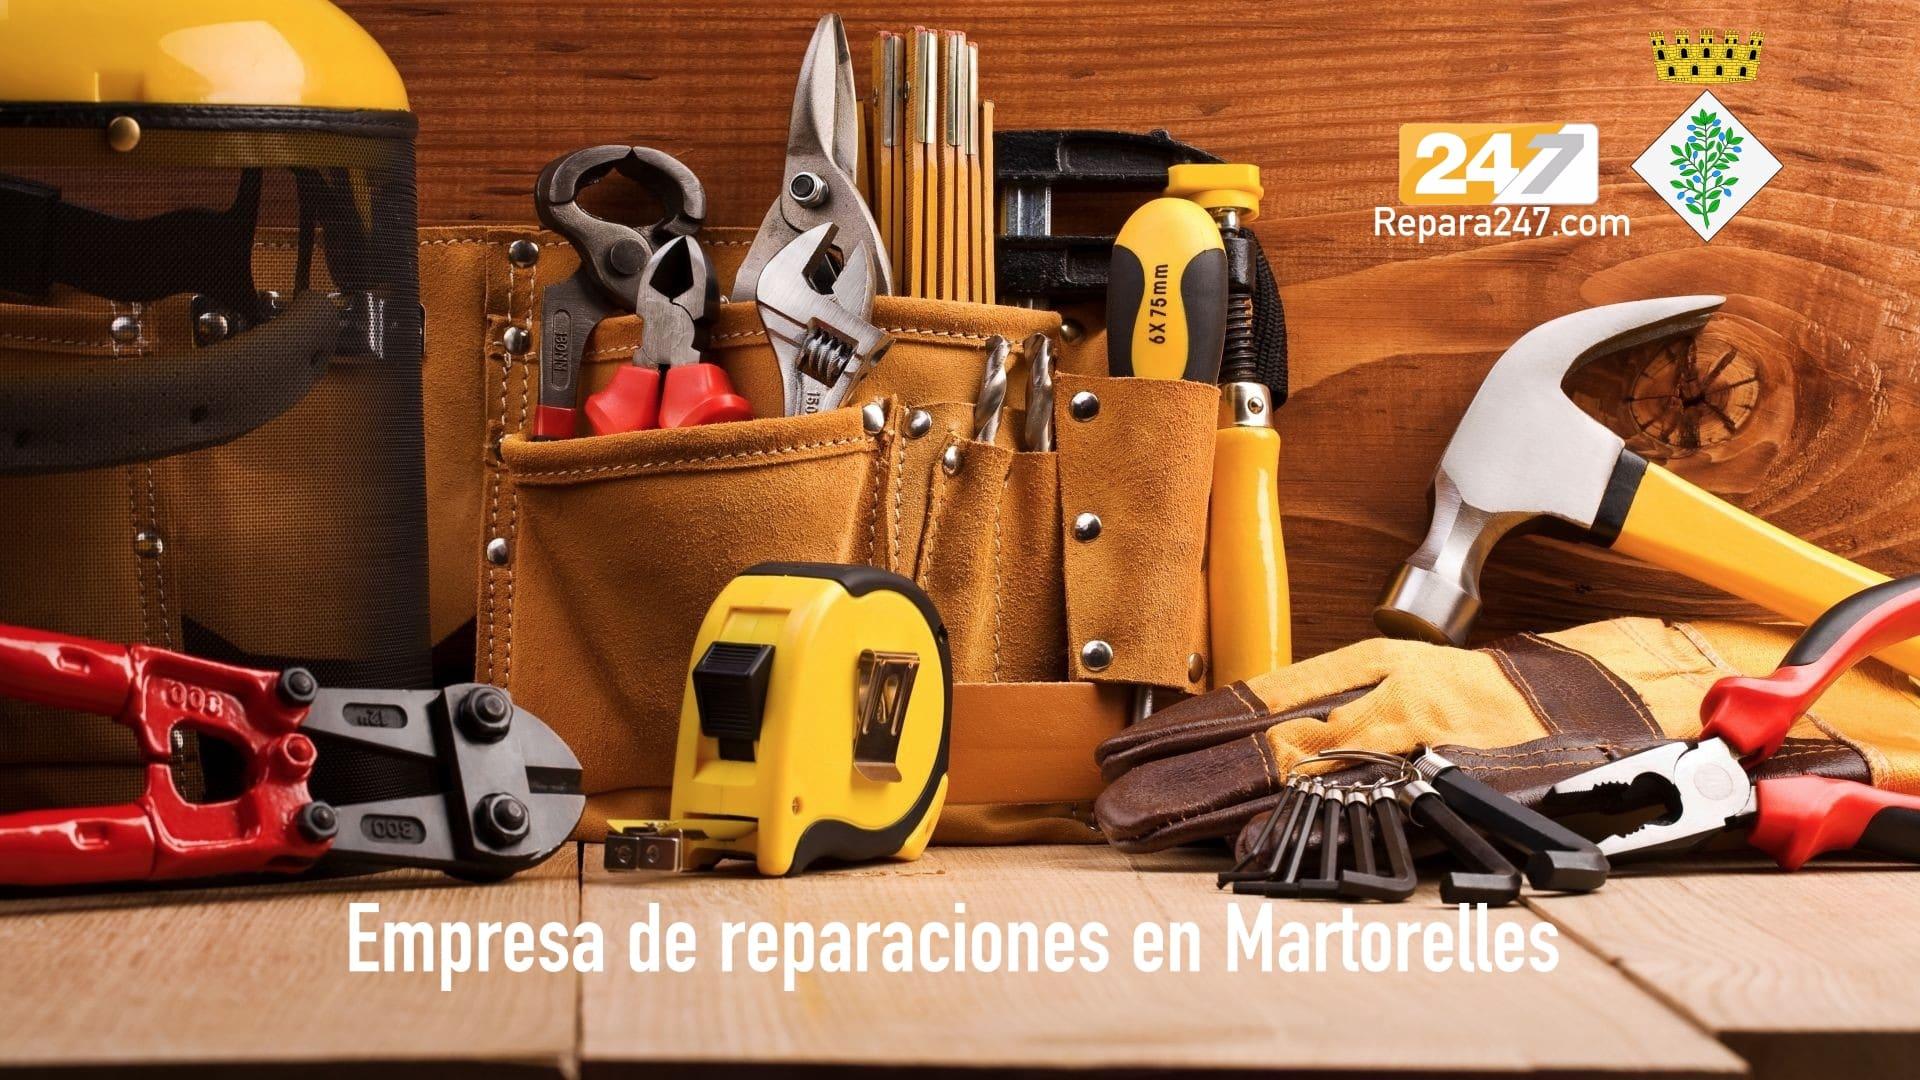 Empresa de reparaciones en Martorelles